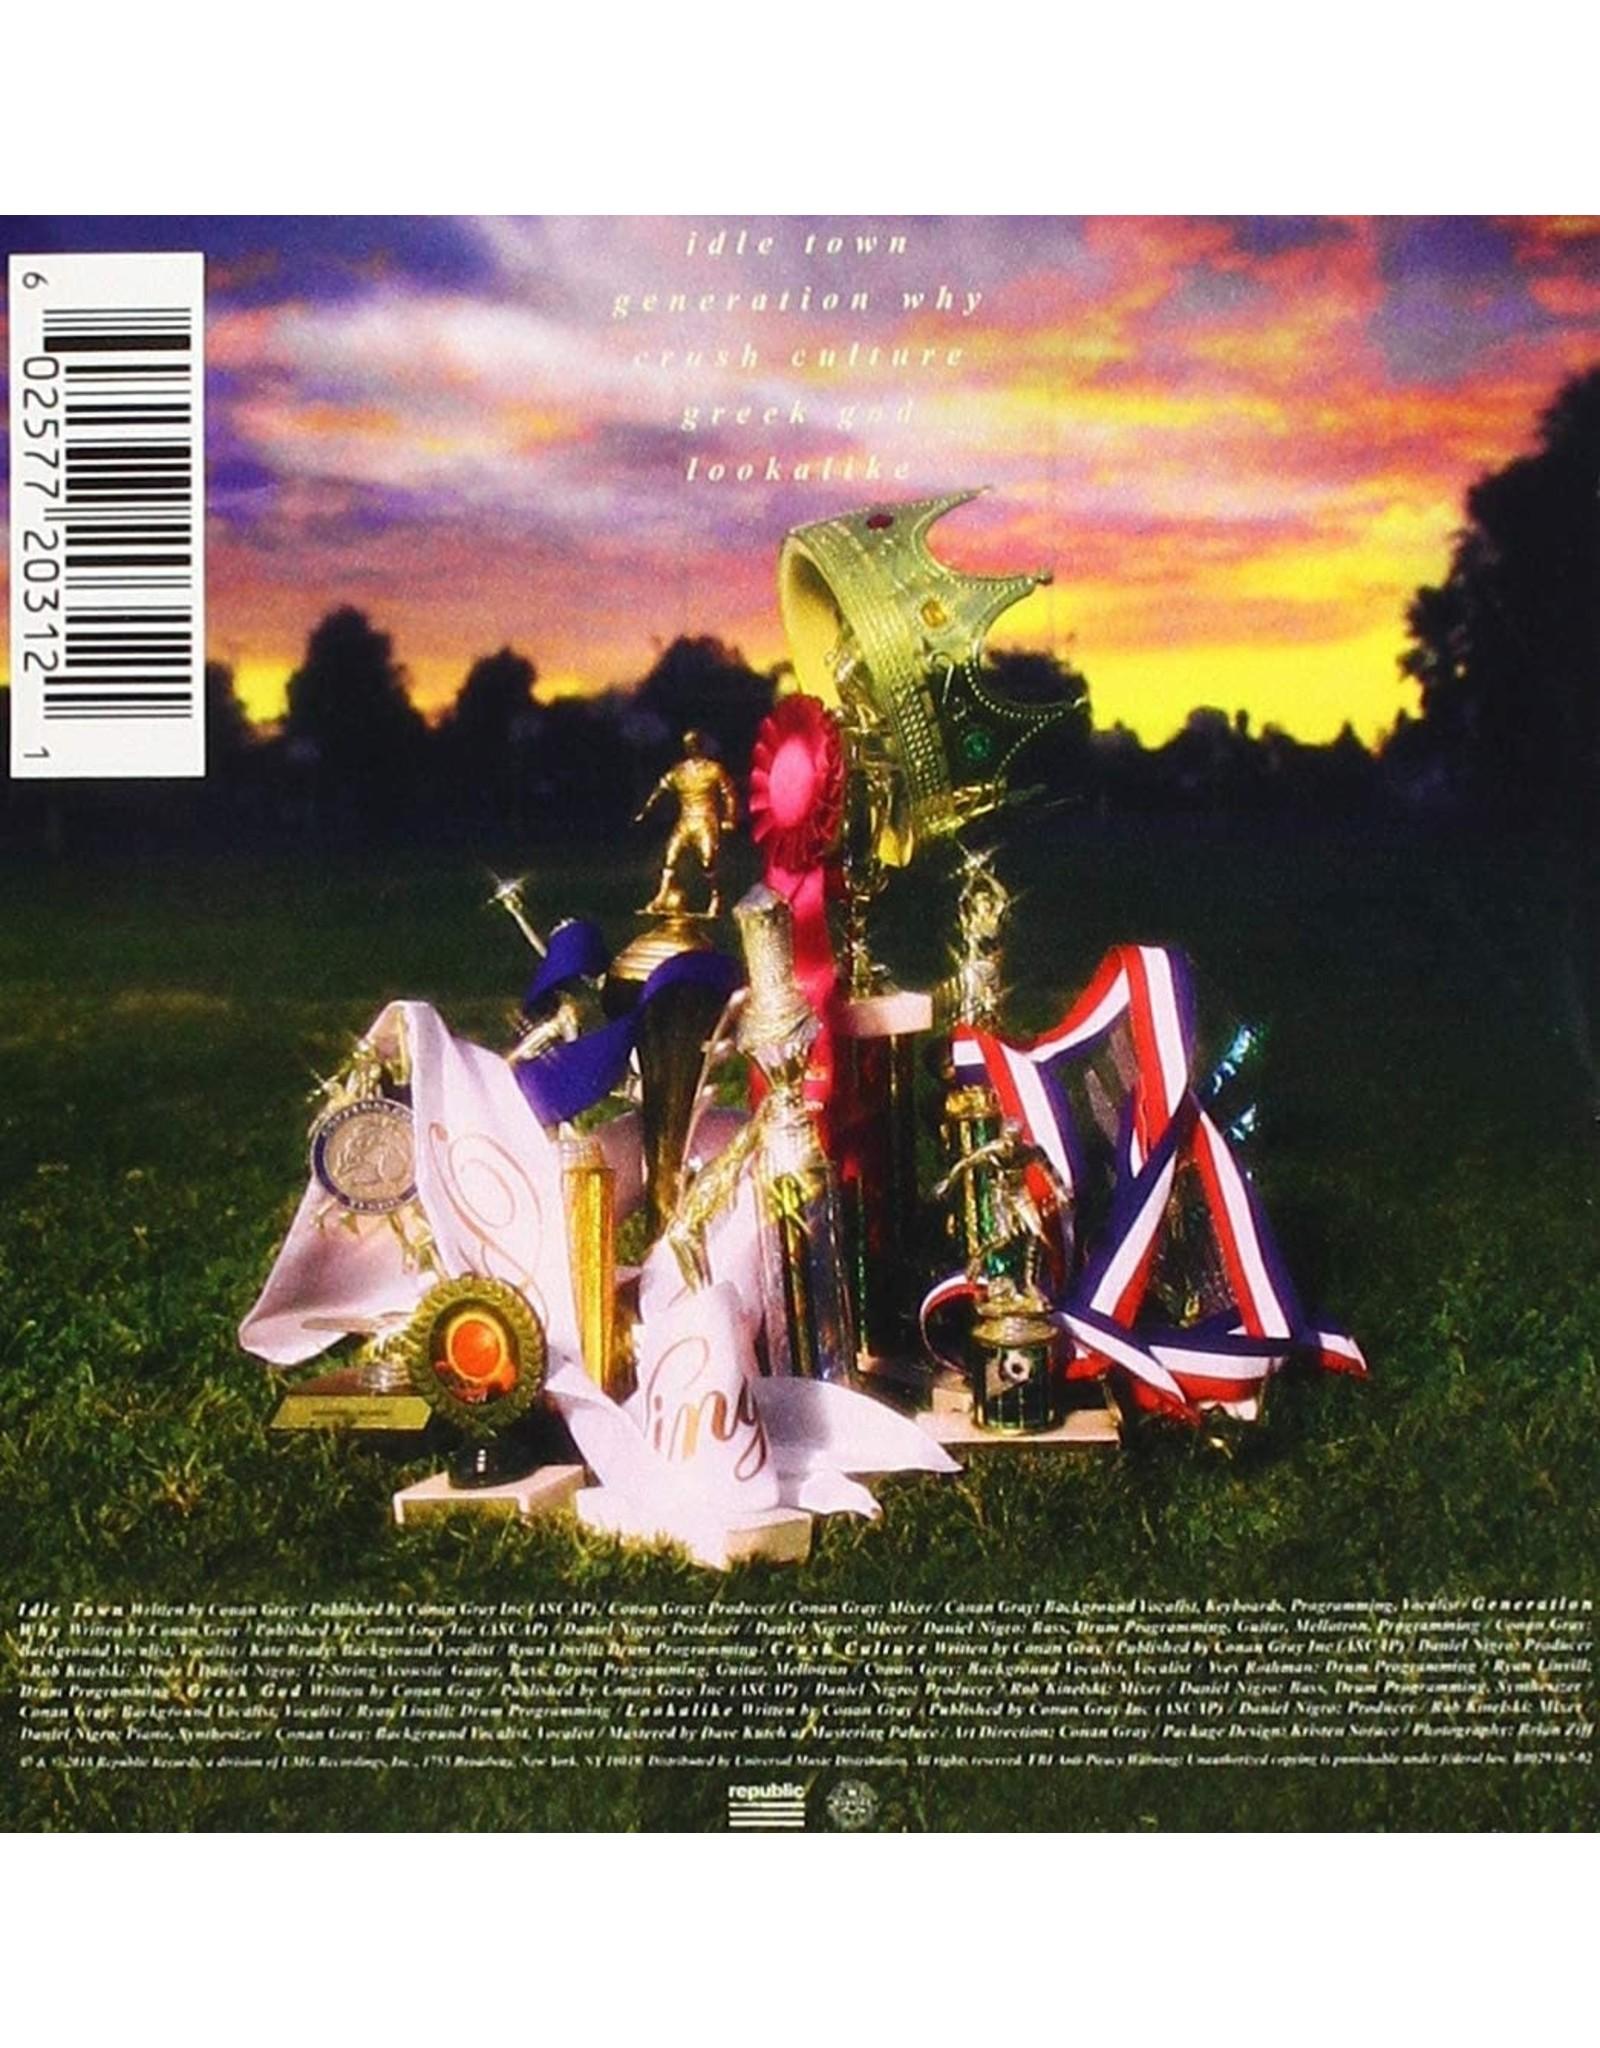 Conan Gray - Sunset Season EP (Blue Vinyl)